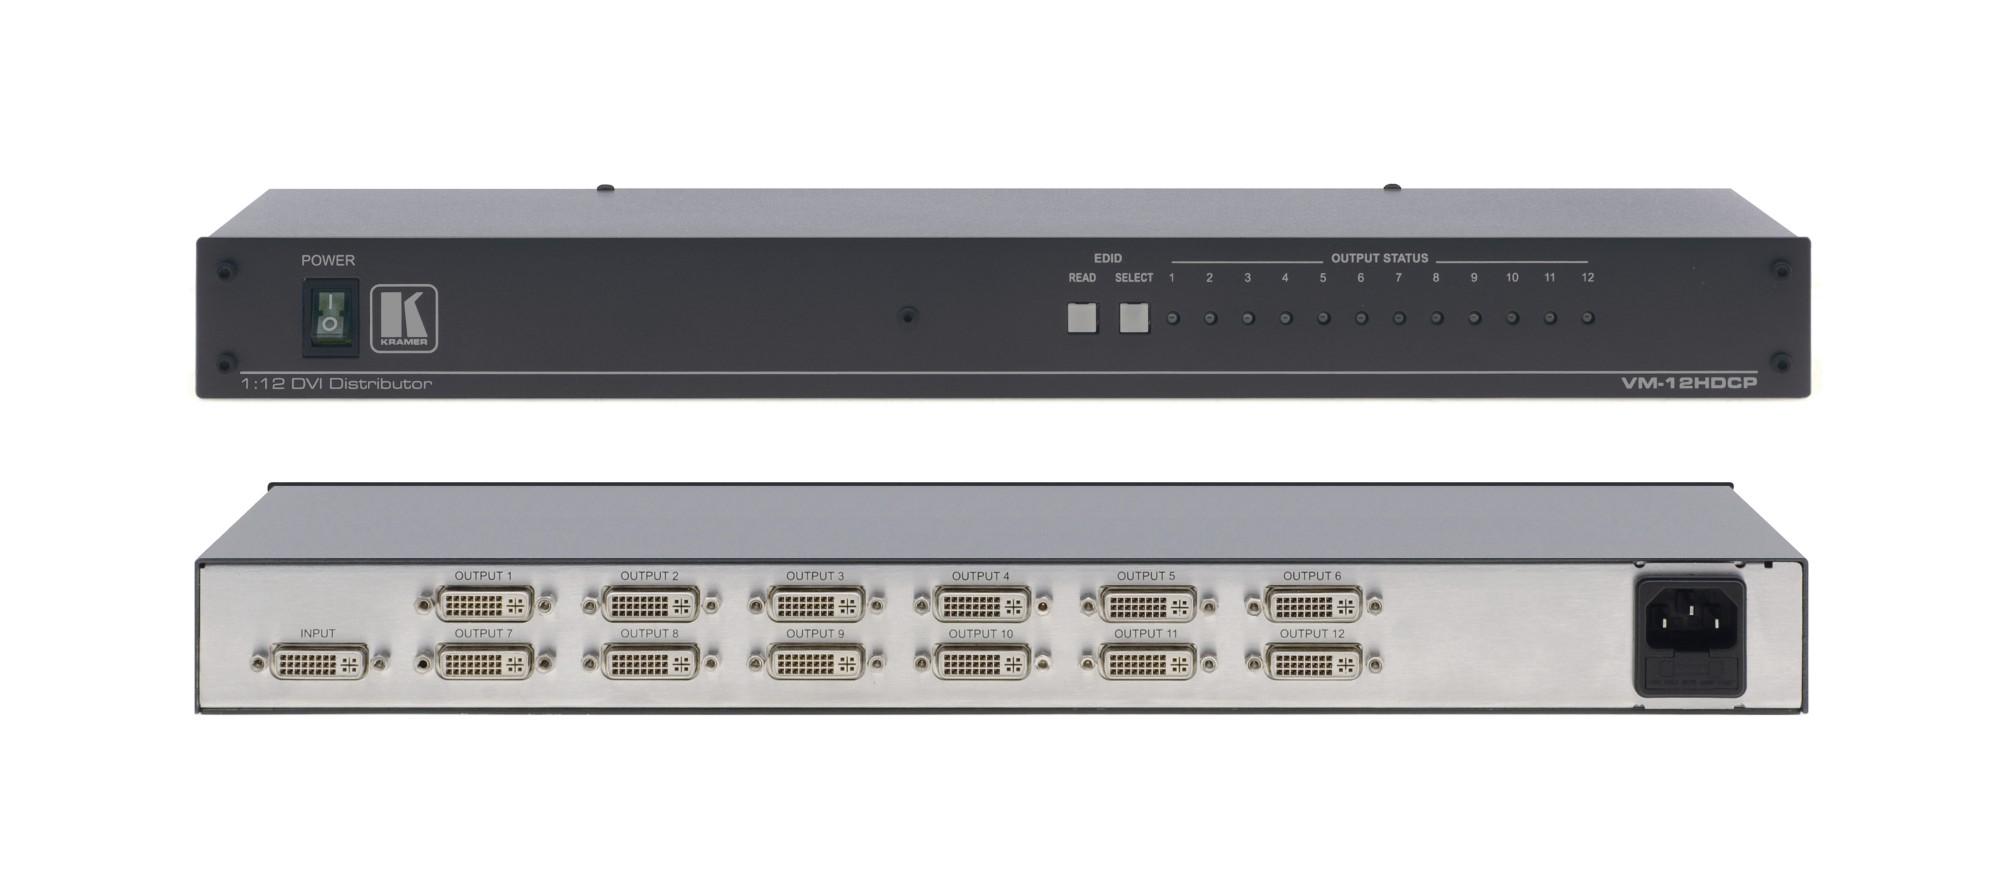 Kramer Electronics VM-12HDCP video line amplifier